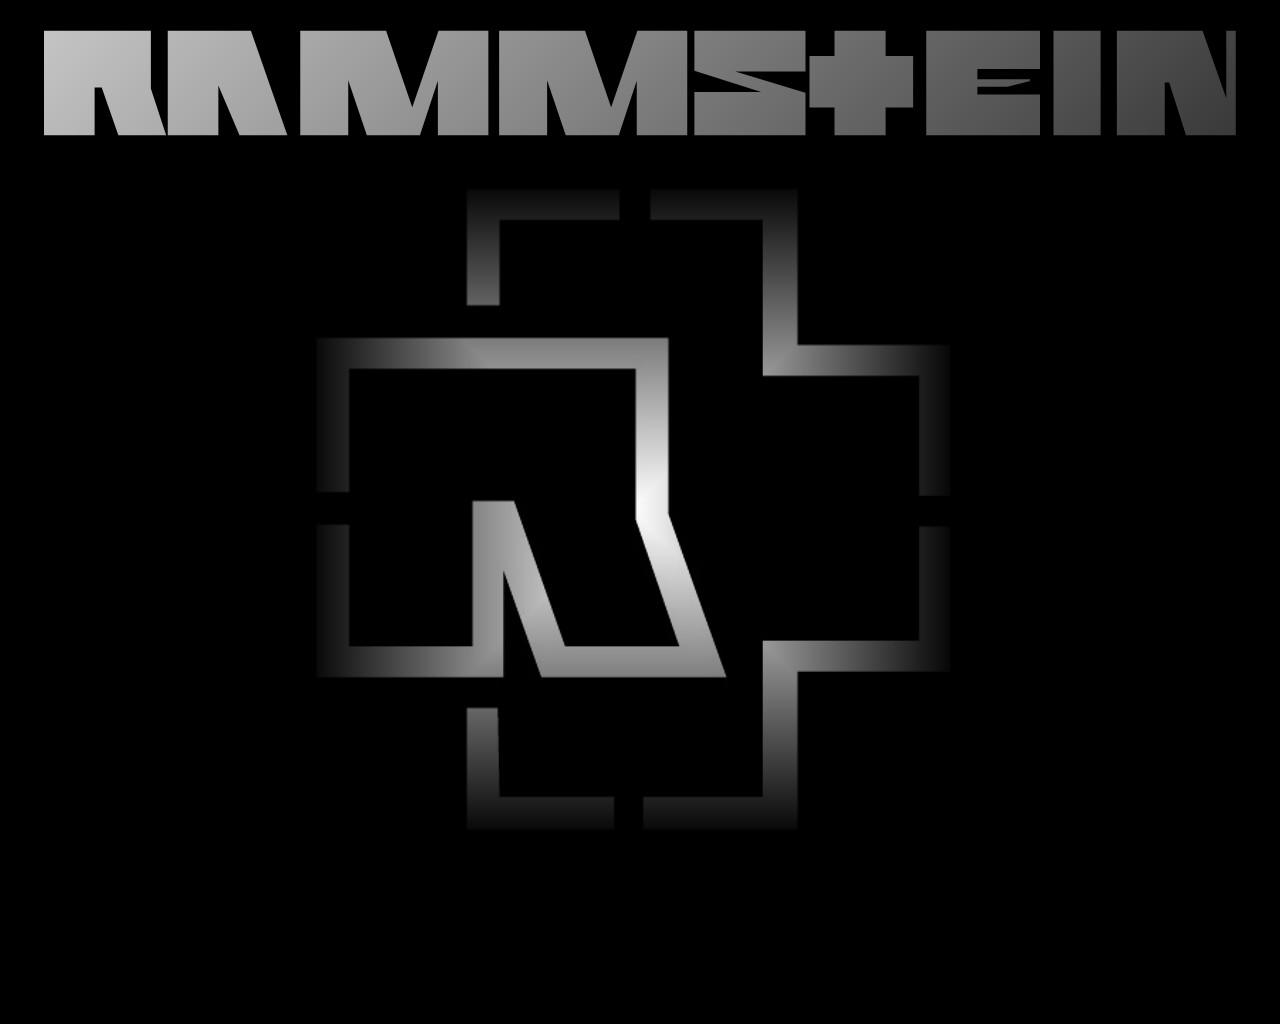 Download Wallpaper Logo Rammstein - rammstein_wallpaper_4_by_ozzyhelter  Photograph_121024.jpg